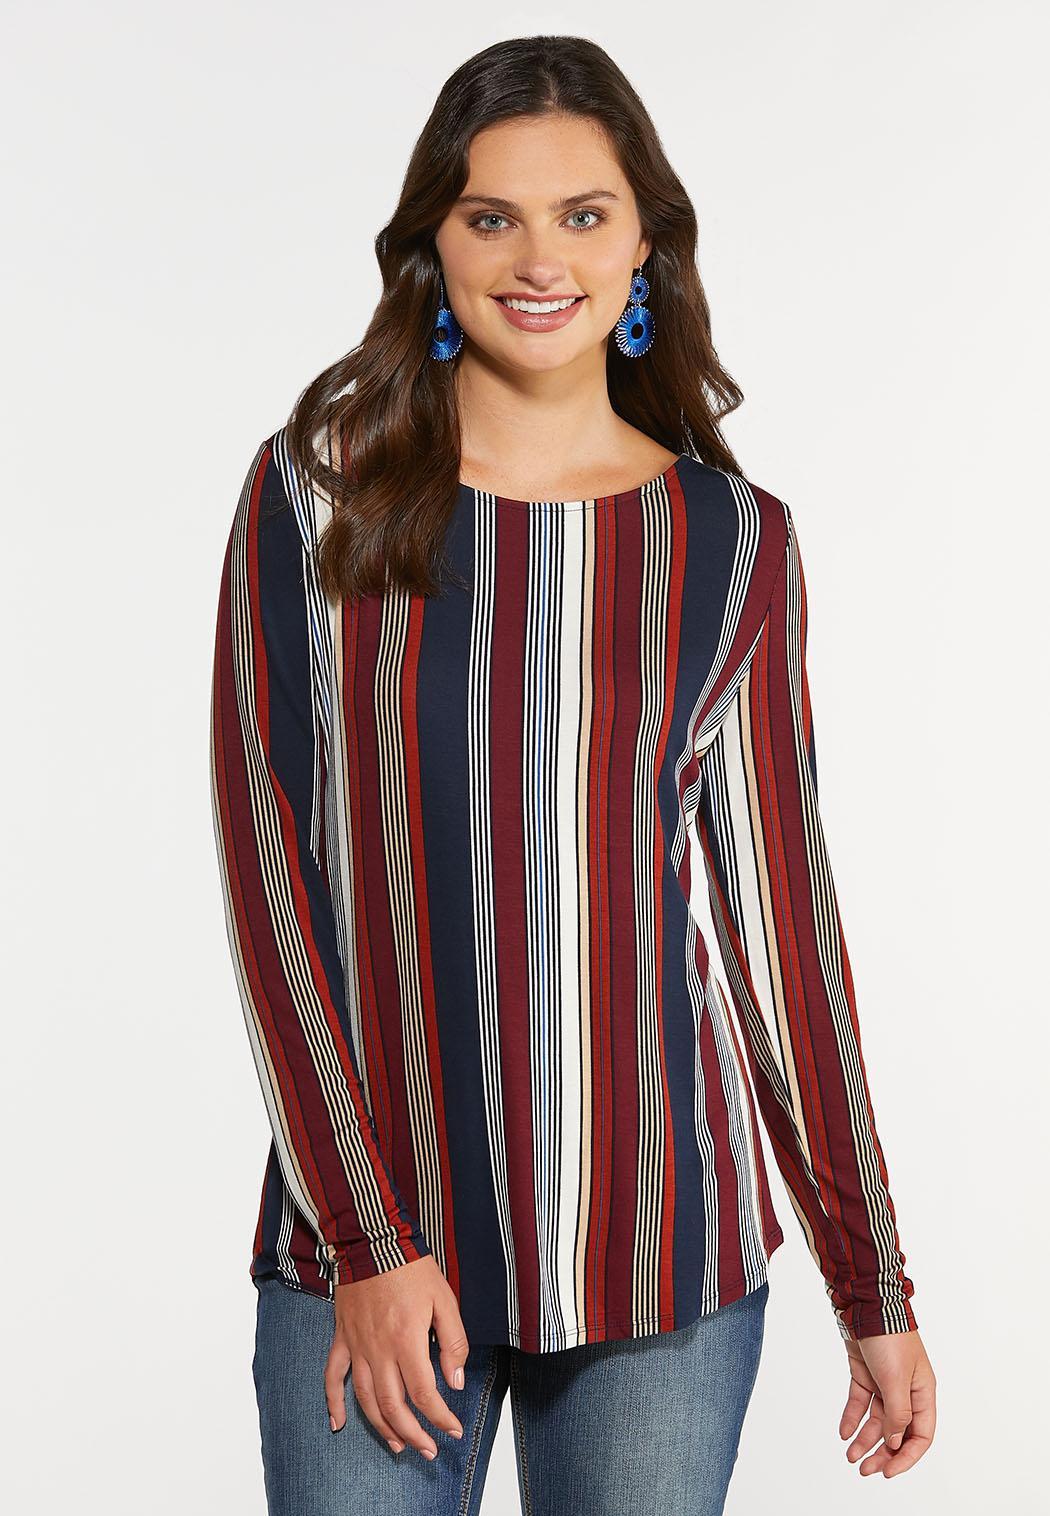 Berry Stripe Top